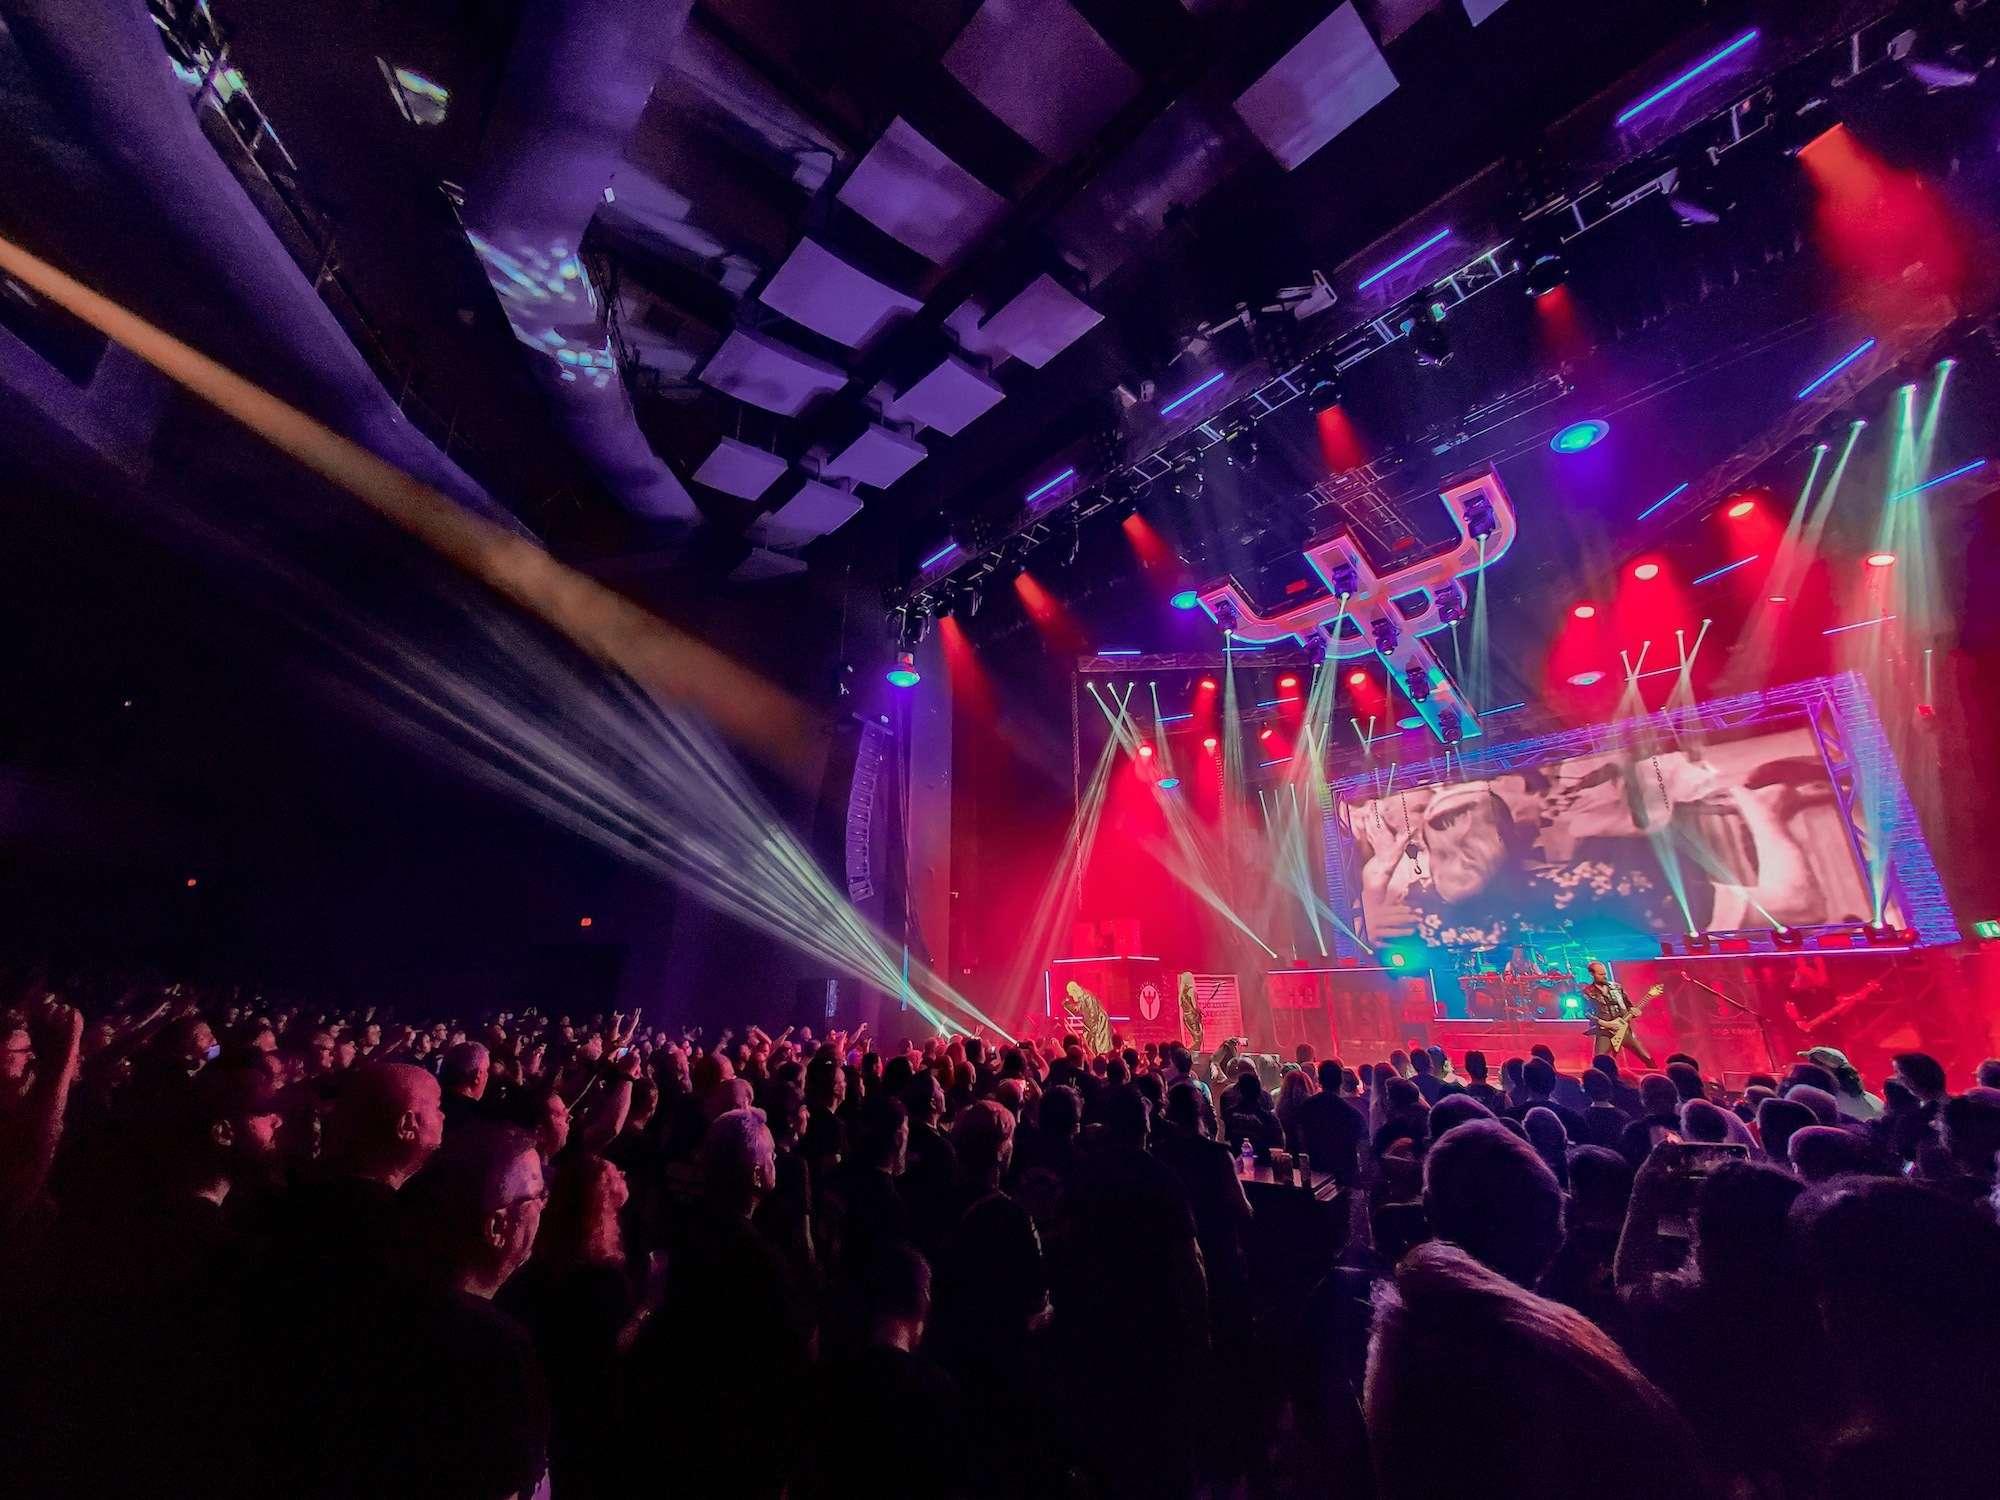 Judas Priest Live at Rosemont Theatre [GALLERY] 23